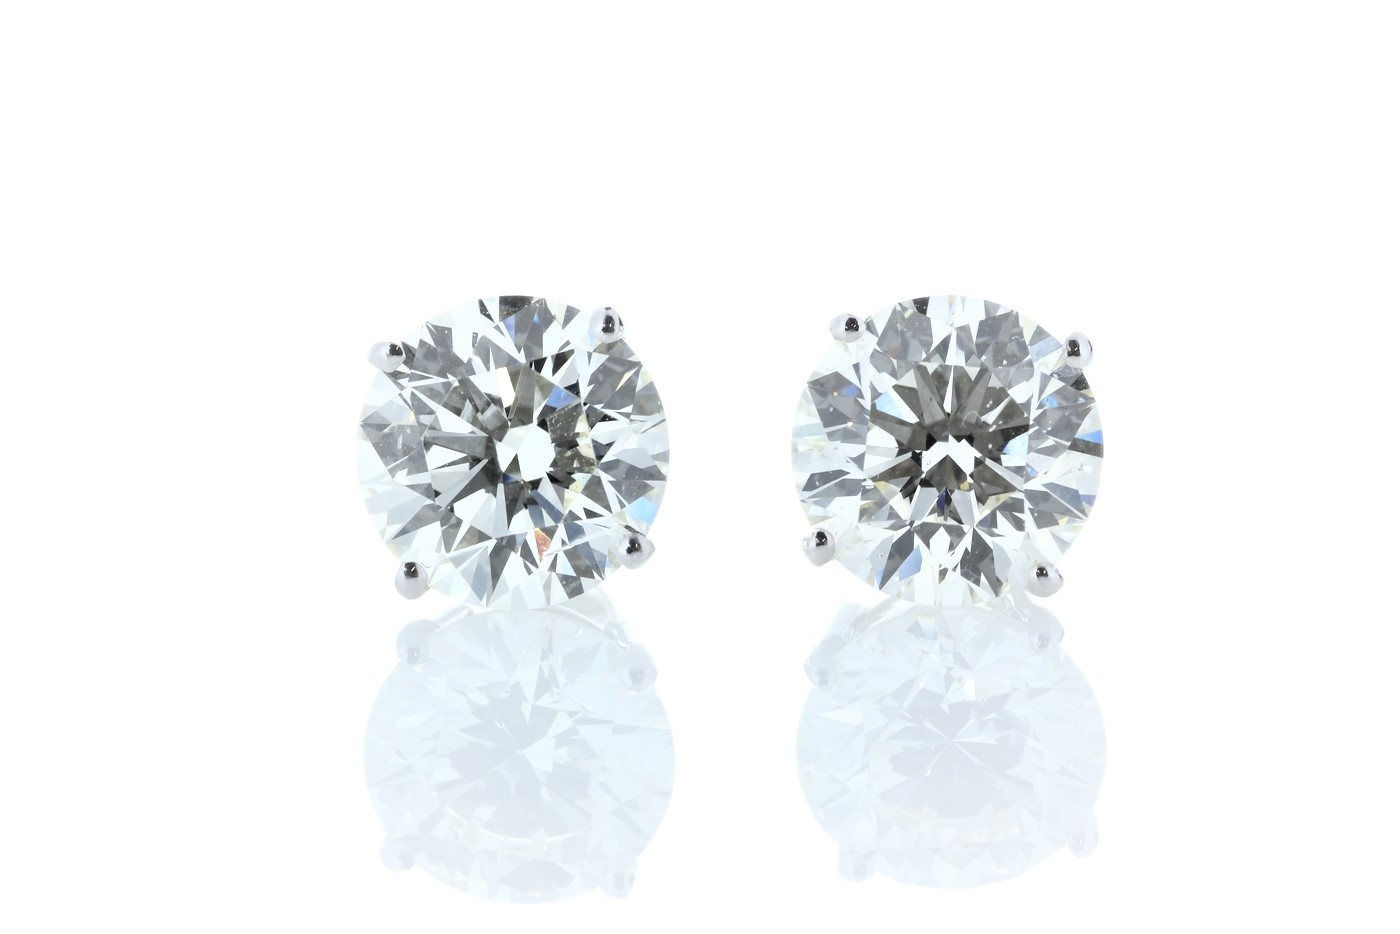 18ct White Gold Prong Set Diamond Earring 11.00 Carats